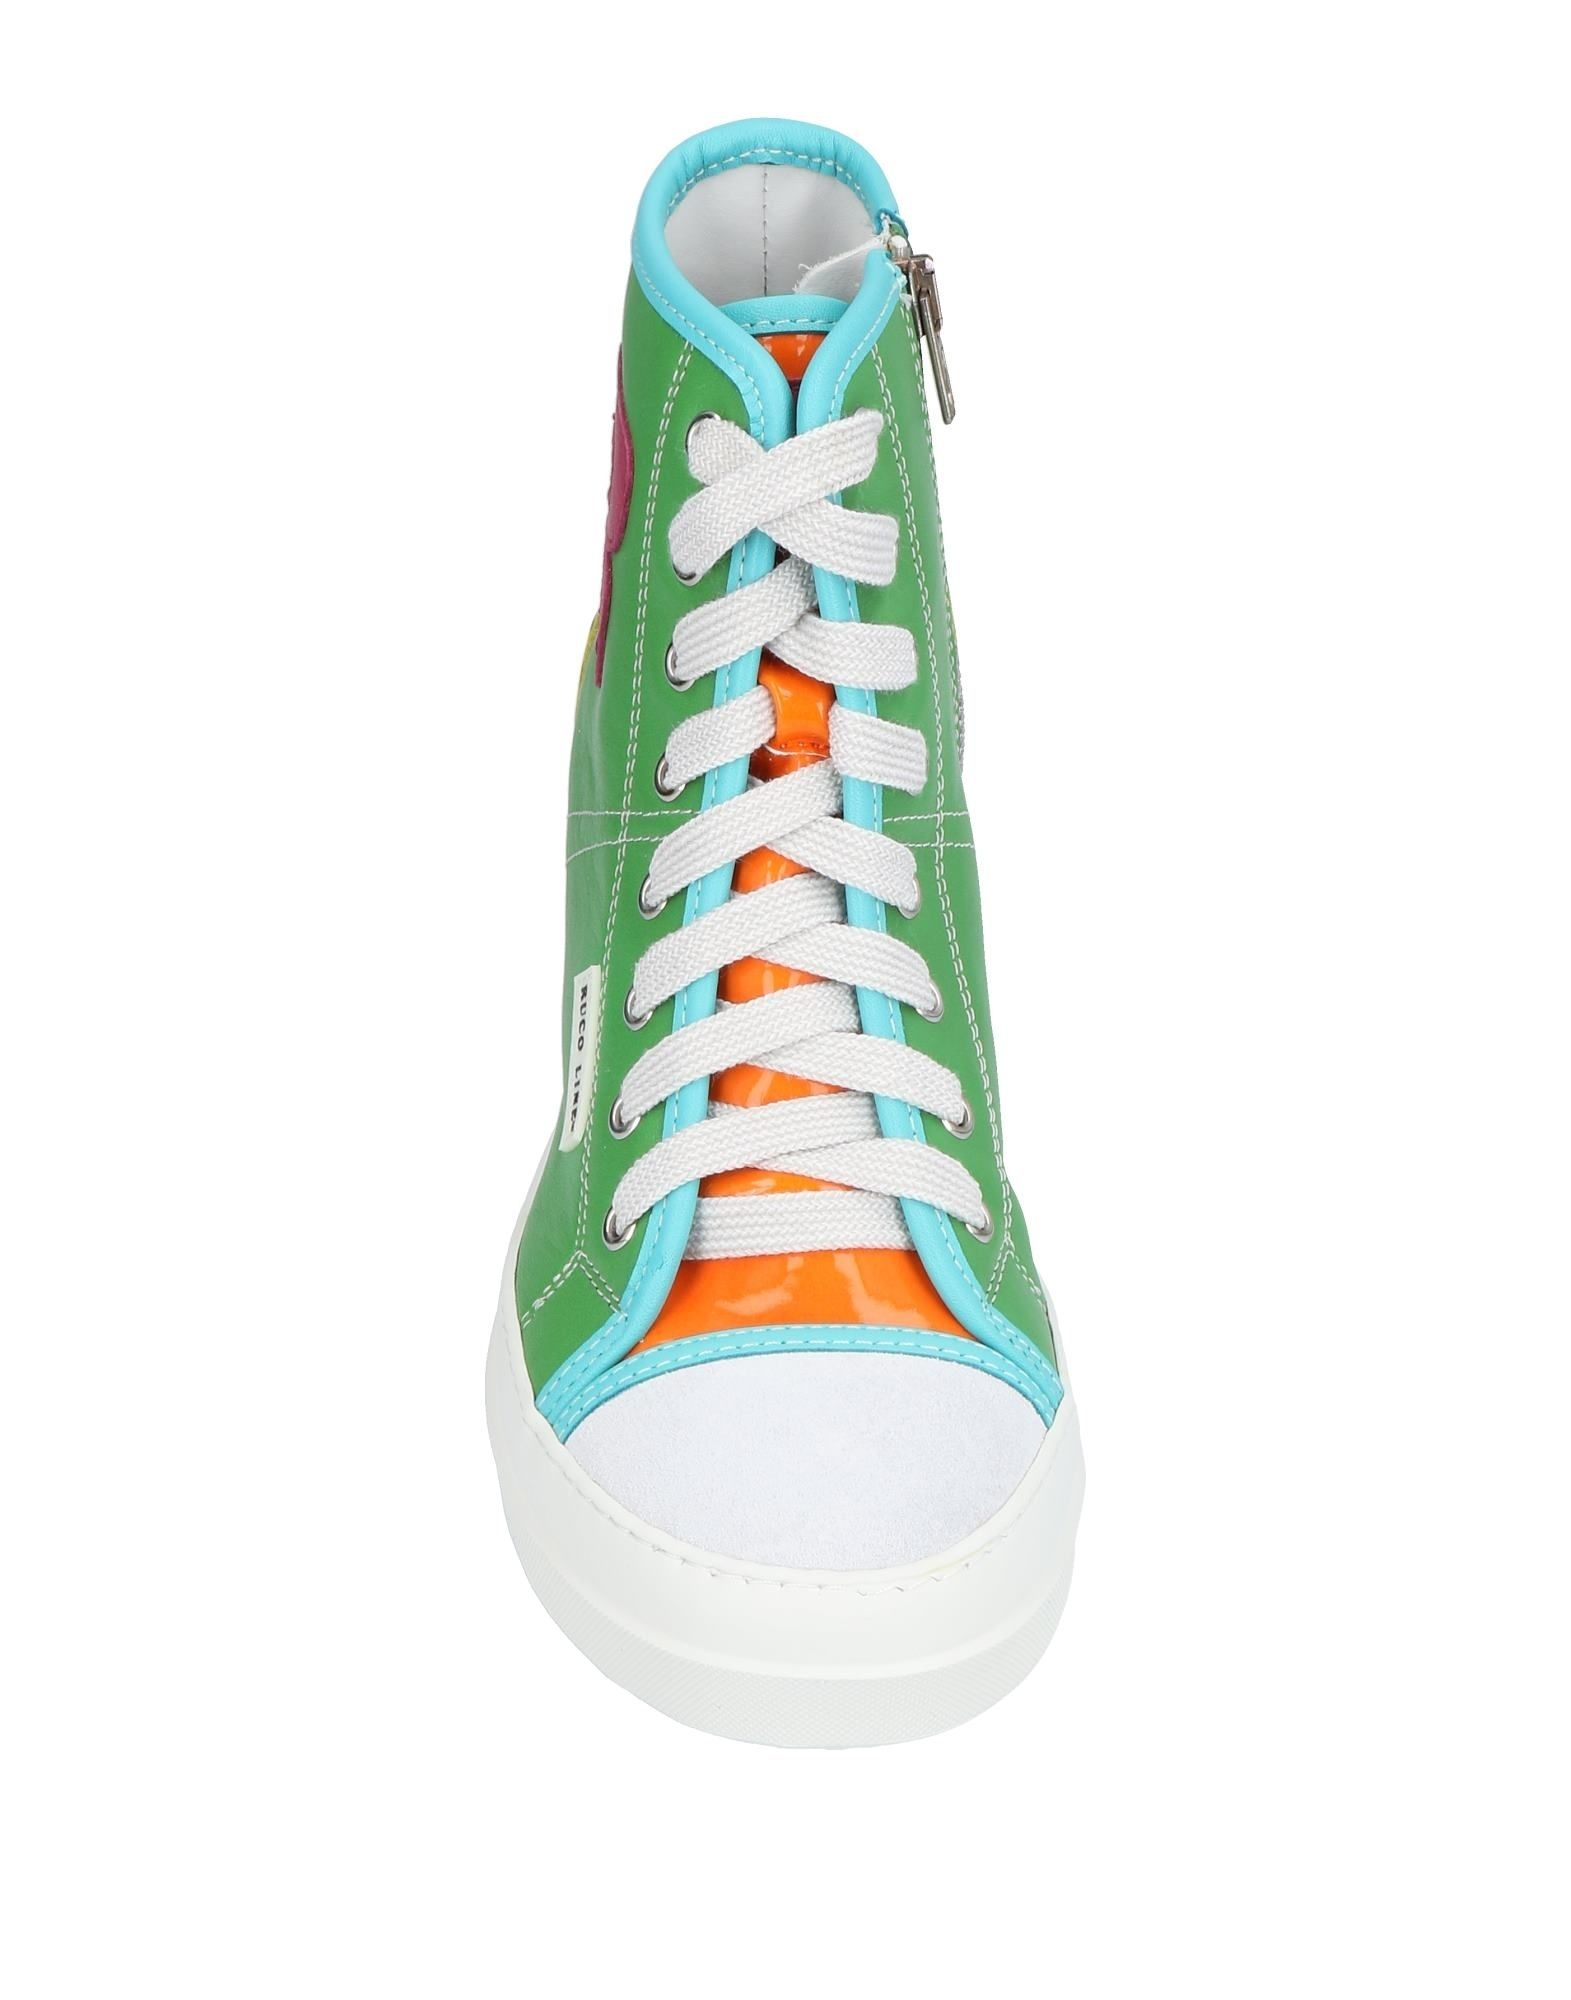 Stilvolle billige Damen Schuhe Ruco Line Sneakers Damen billige  11467867JW 4b6fa5